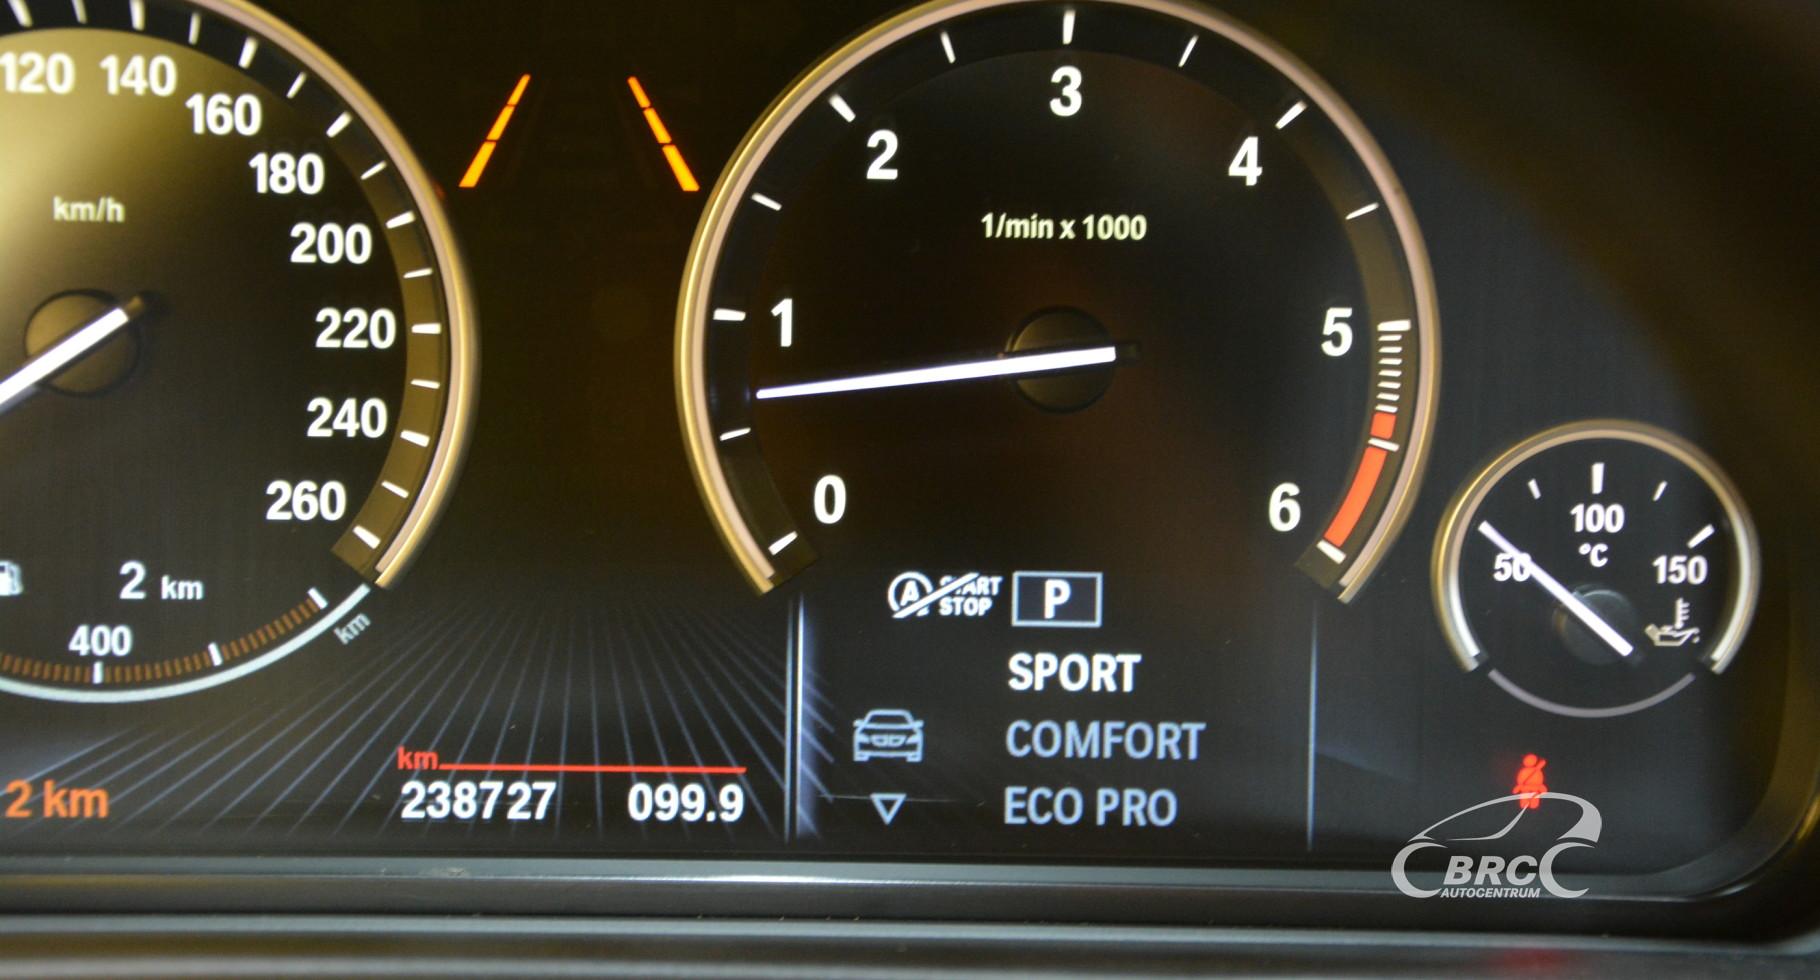 BMW 530 xd Touaring Steptronic